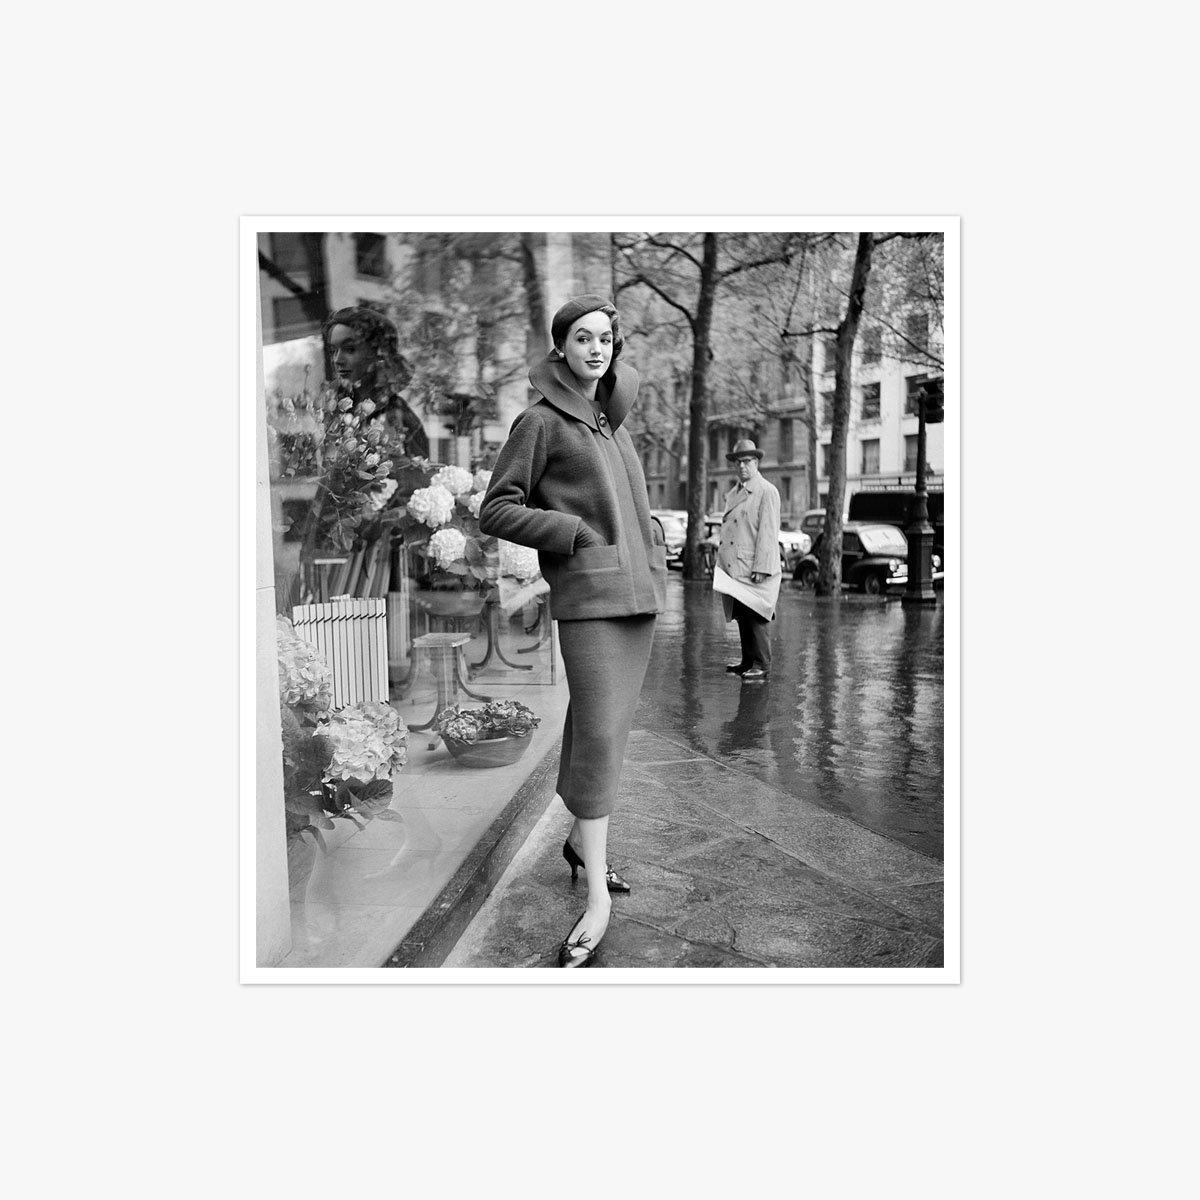 Paris 1950 on a Rainy Day by Marilyn Stafford